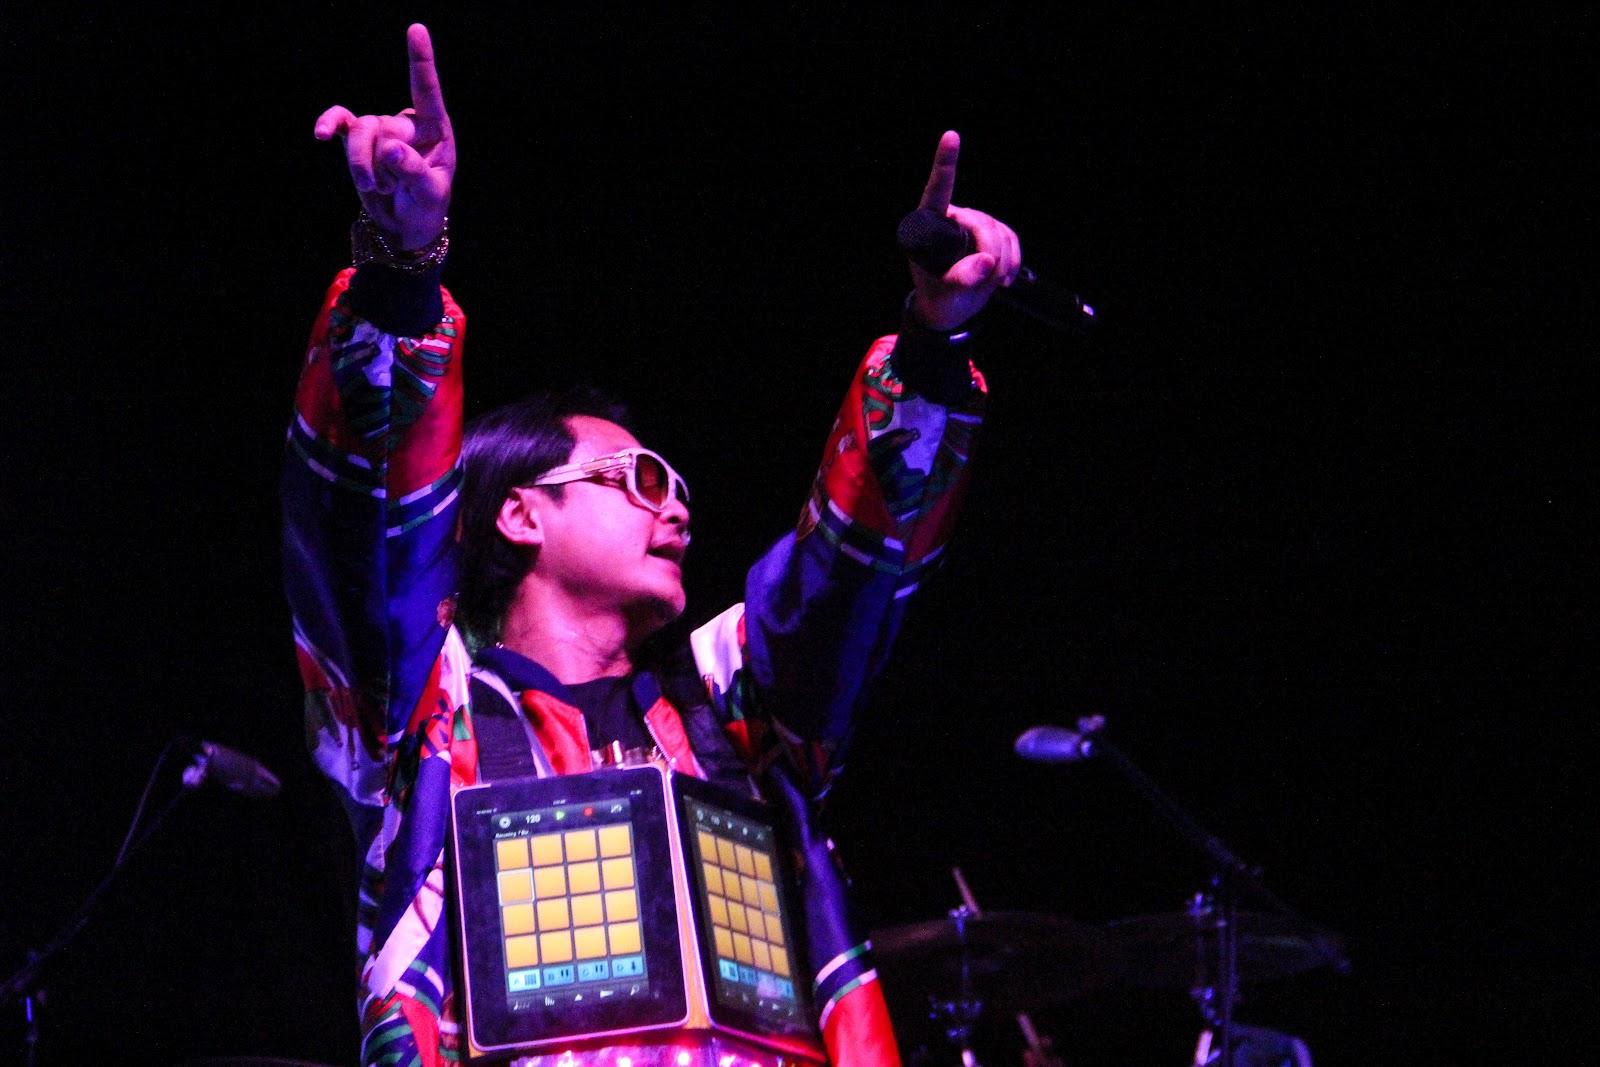 Concert Vault and Daytrotter capture spirit of live shows in the digital age